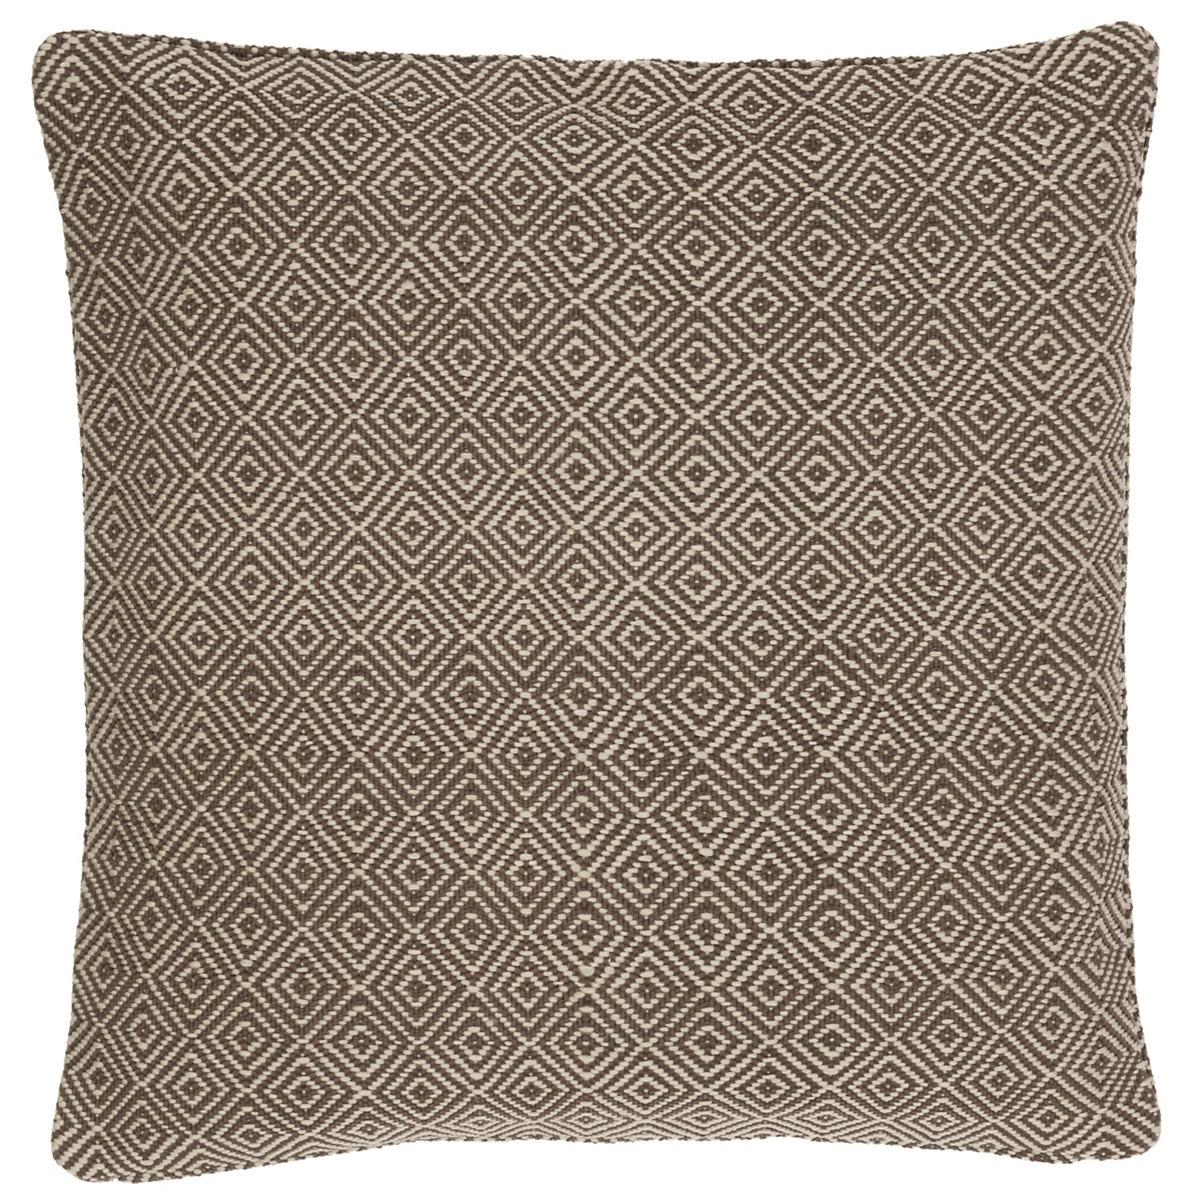 Petit Diamond Charcoal/Platinum Indoor/Outdoor Pillow